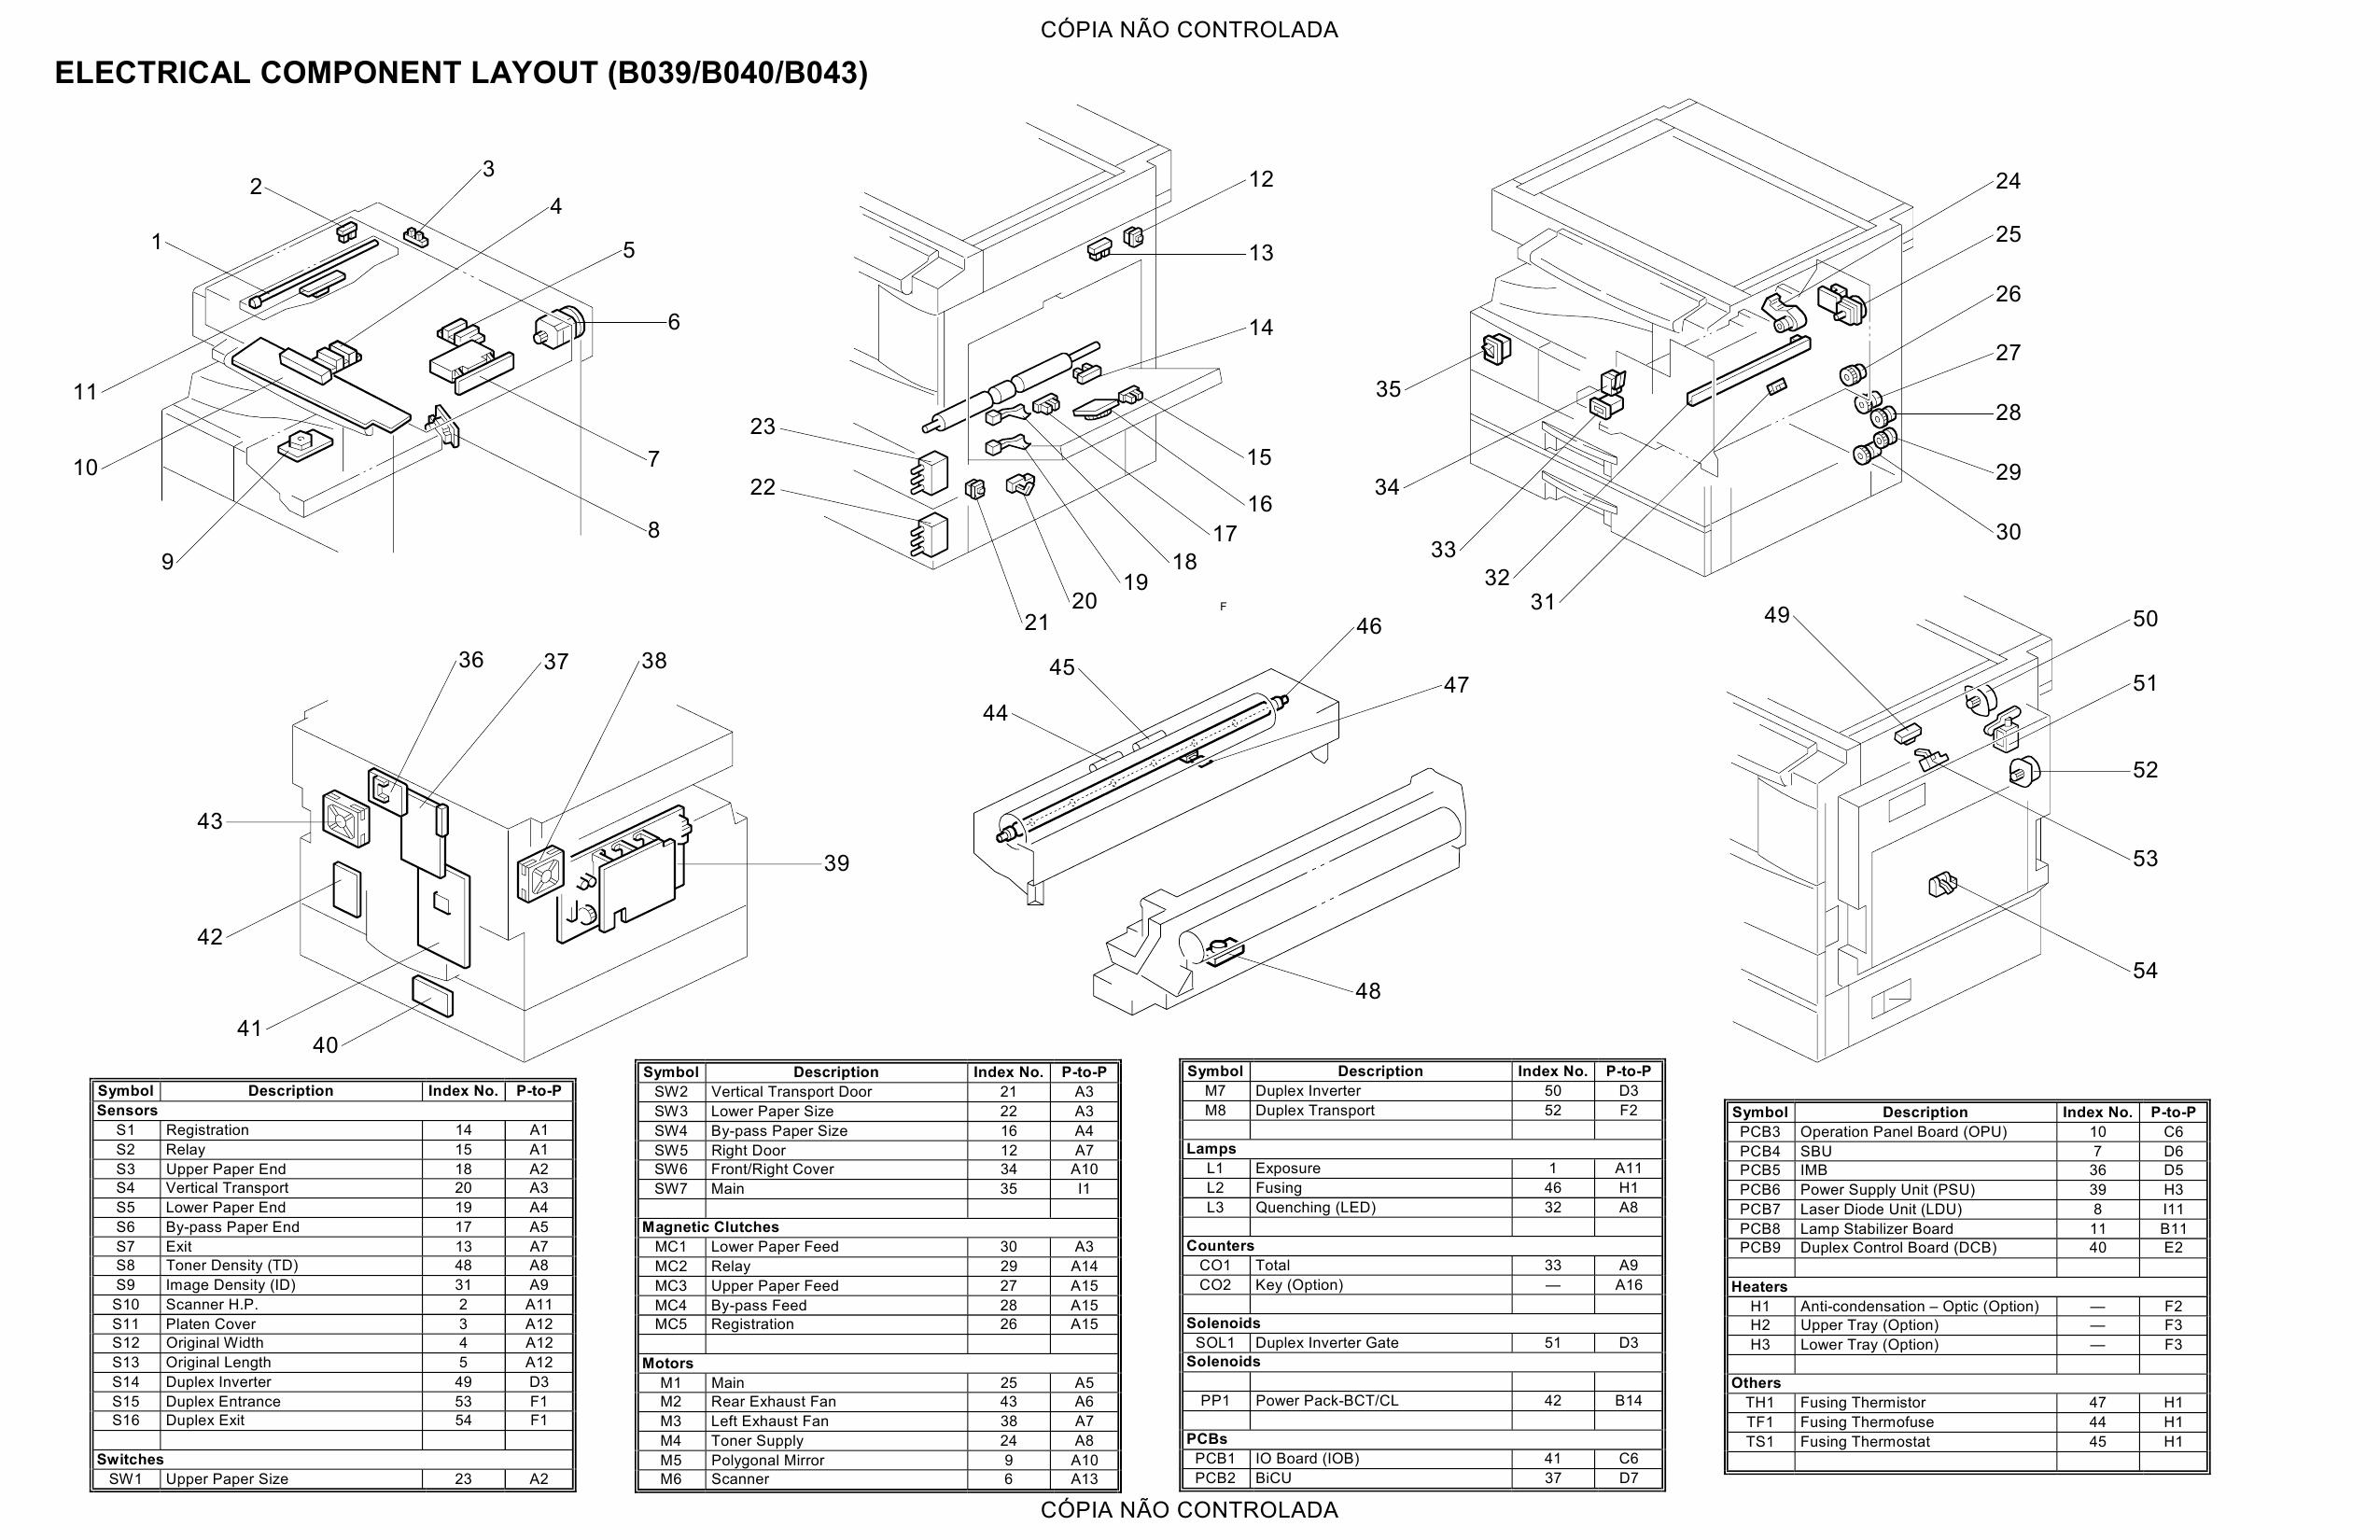 RICOH Aficio 1015 1018 1018D 1113 B039 B040 B043 B120 Circuit Diagram-2